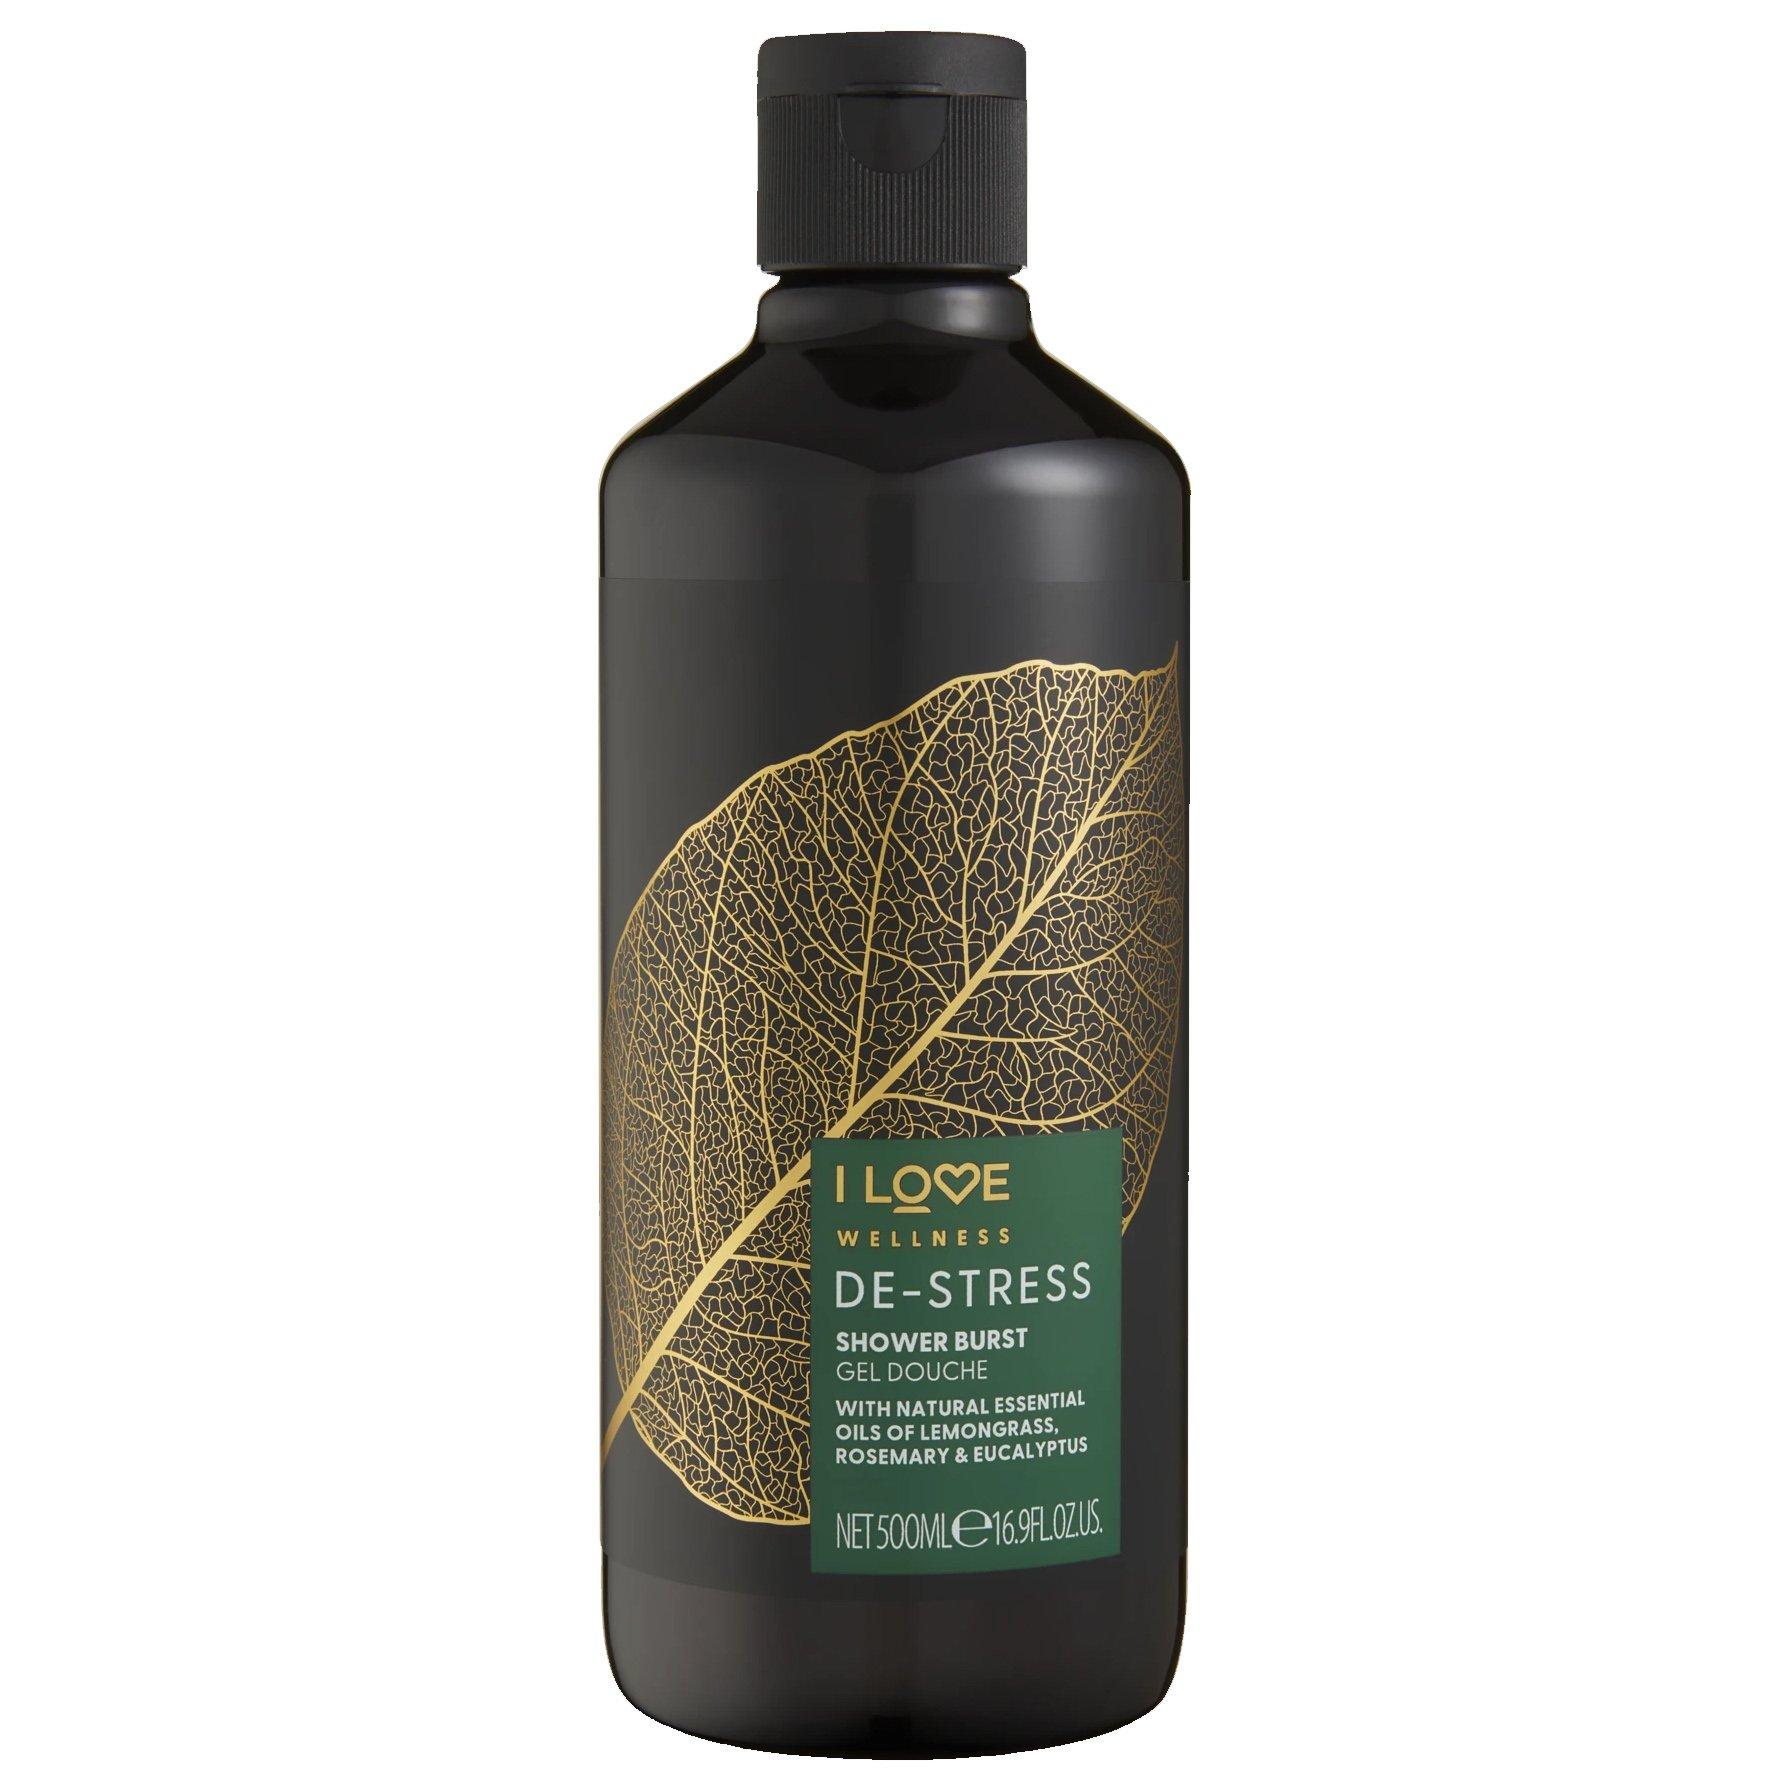 I love… Wellness De-Stress Shower Burst Gel Douche Χαλαρωτικό Αφρόλουτρο με Φυσικά Αιθέρια Έλαια 500ml